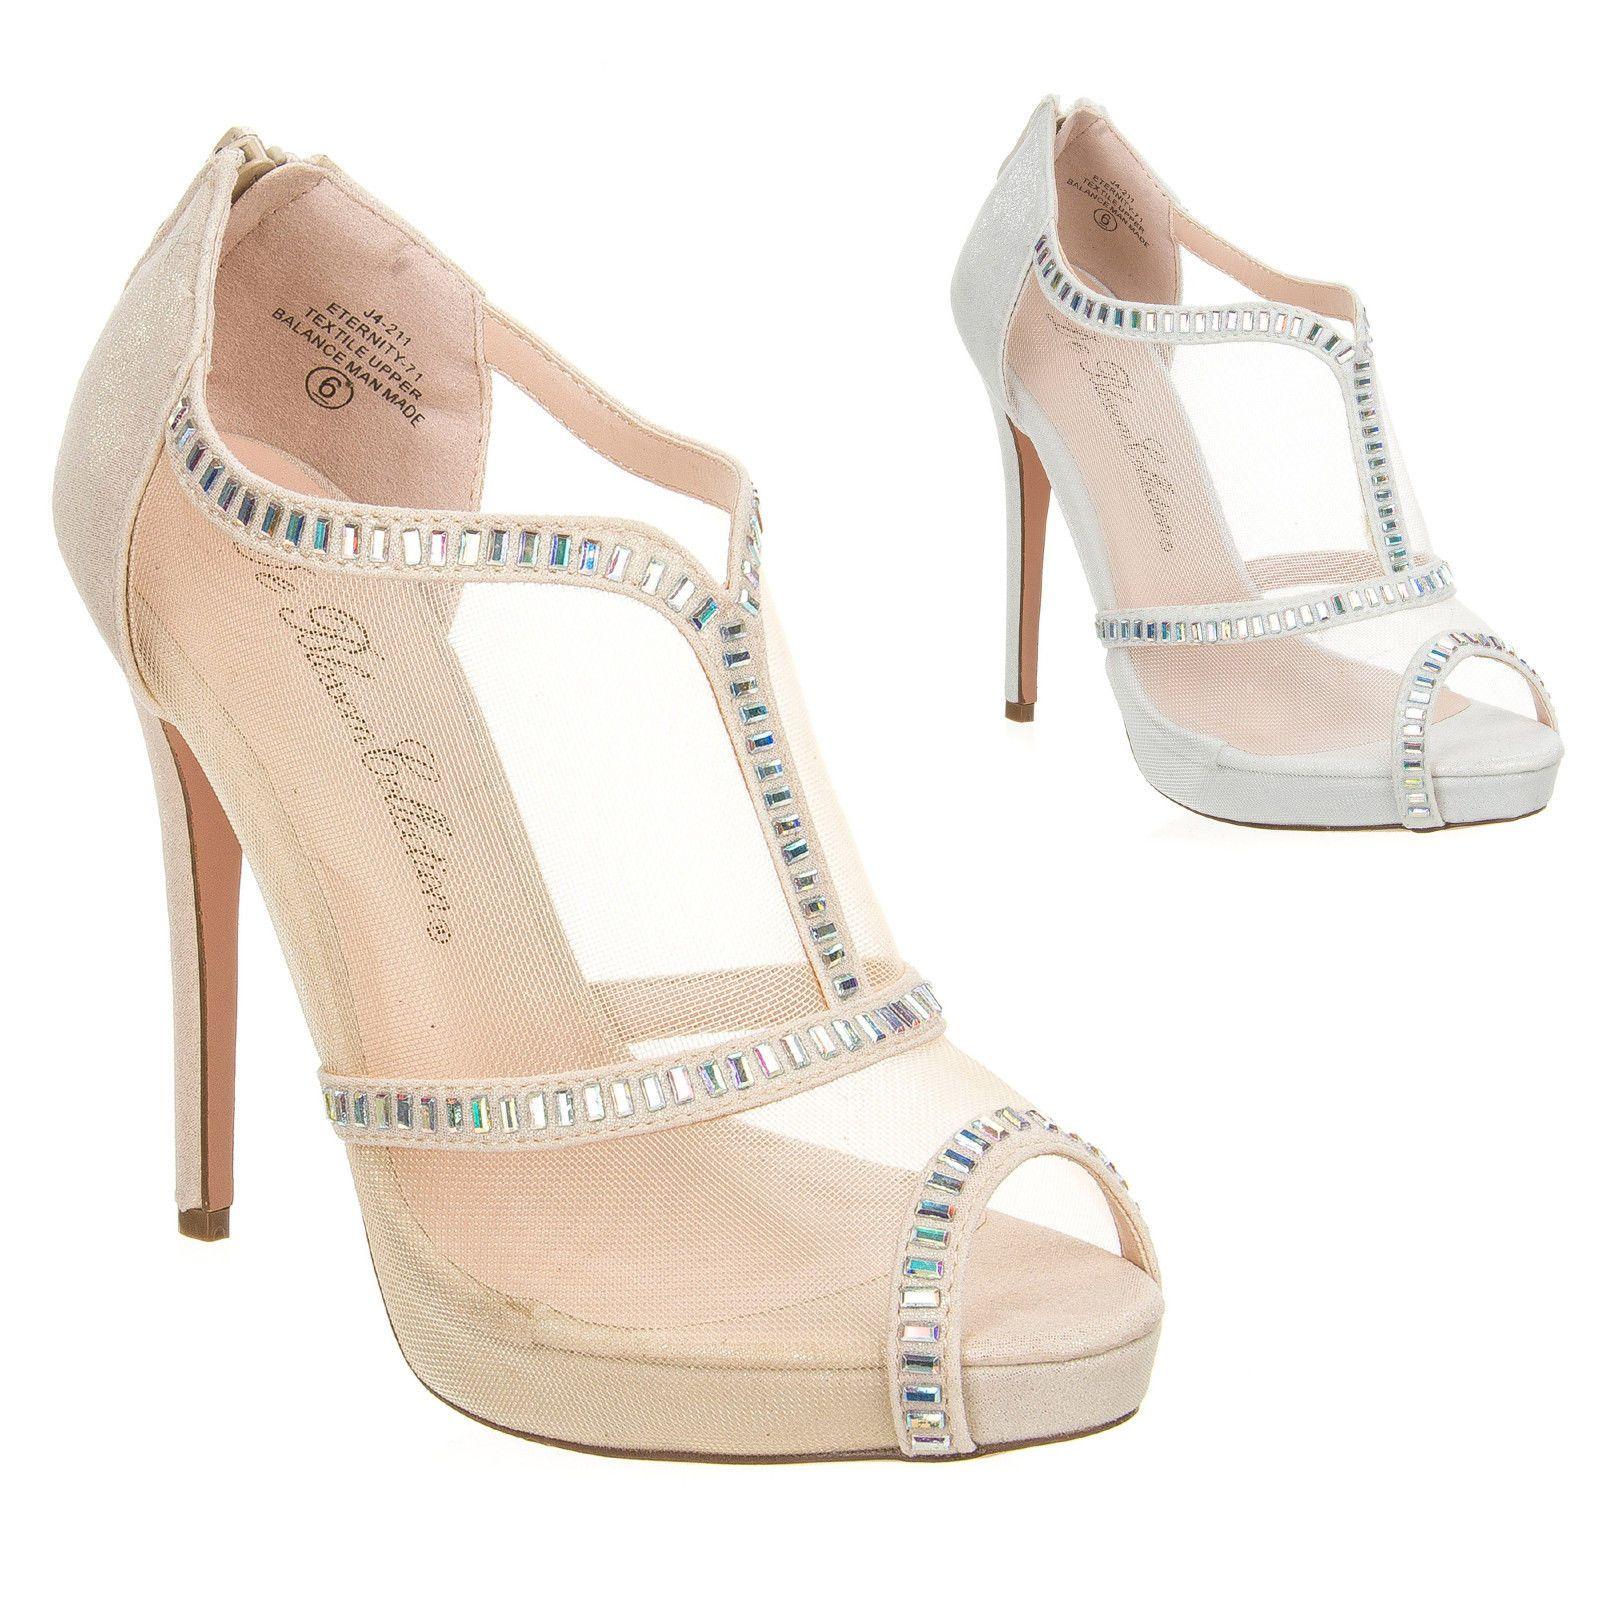 e1ede1388fe Wedding Bridesmaid Mesh High Heel Ankle Shootie Pumps Crystal Eternity 71   sparkly  illusion